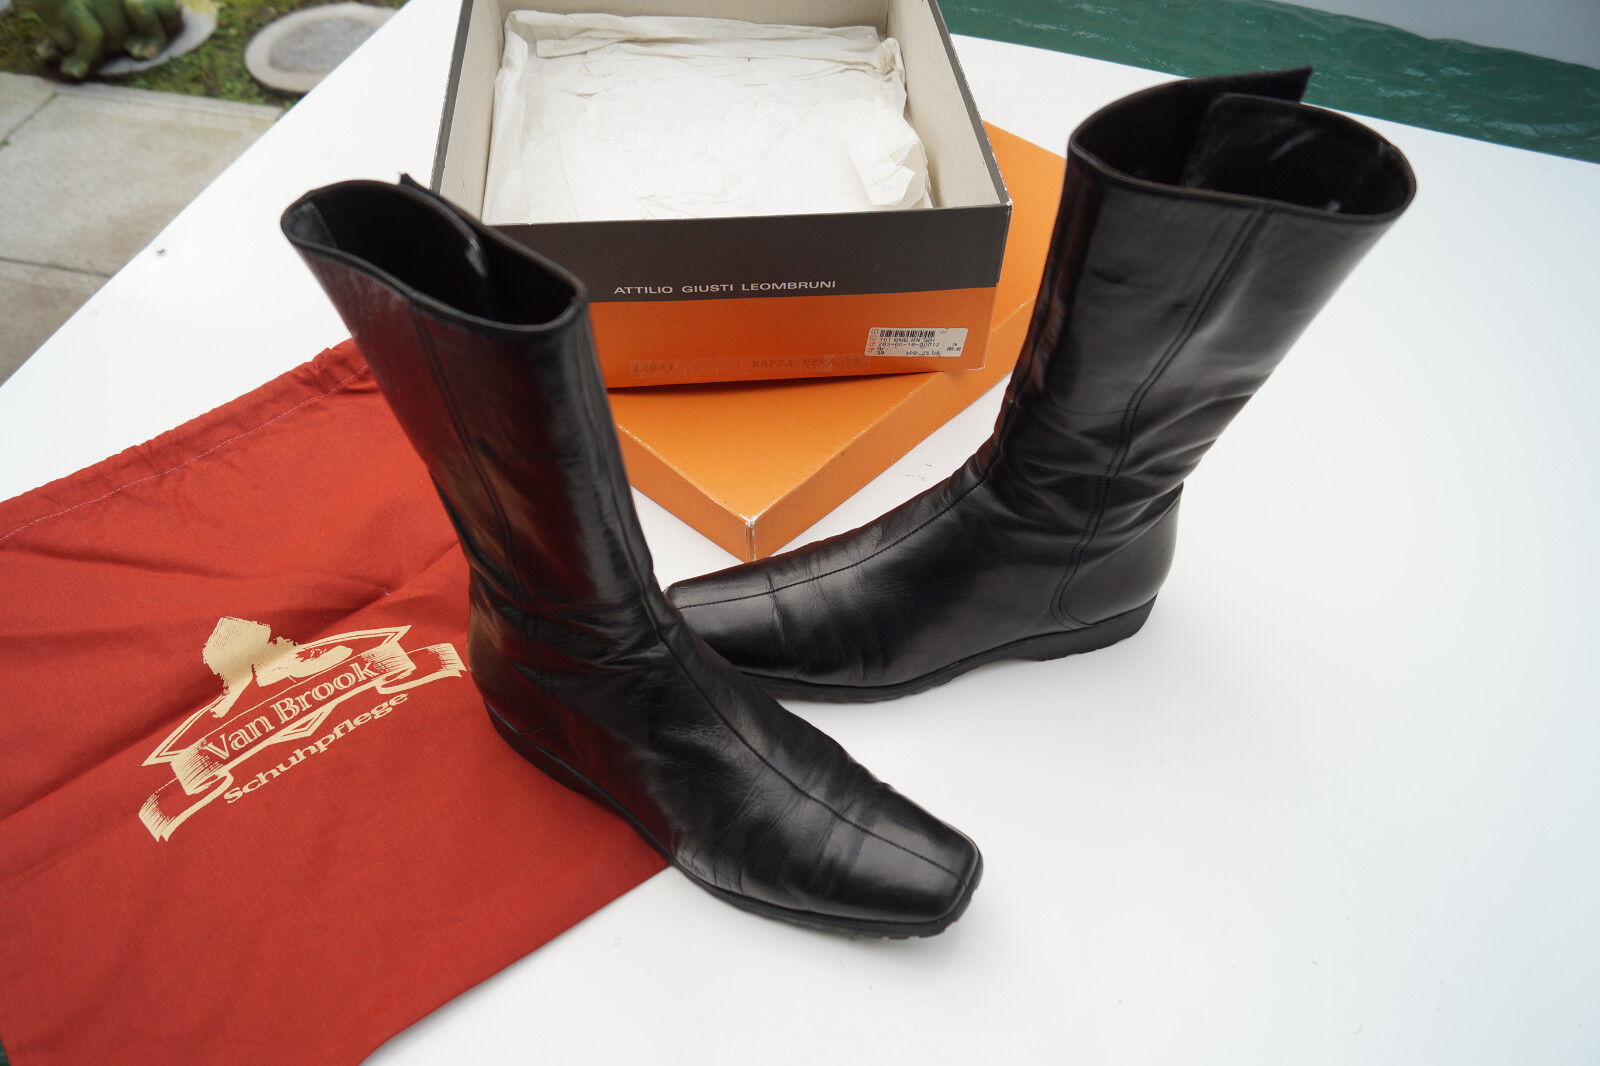 Attilio Giusti Schuhe Leombruni AGL Damen Stiefel Schuhe Giusti Stiefel schwarz Gr.39 Leder TOP fa5849